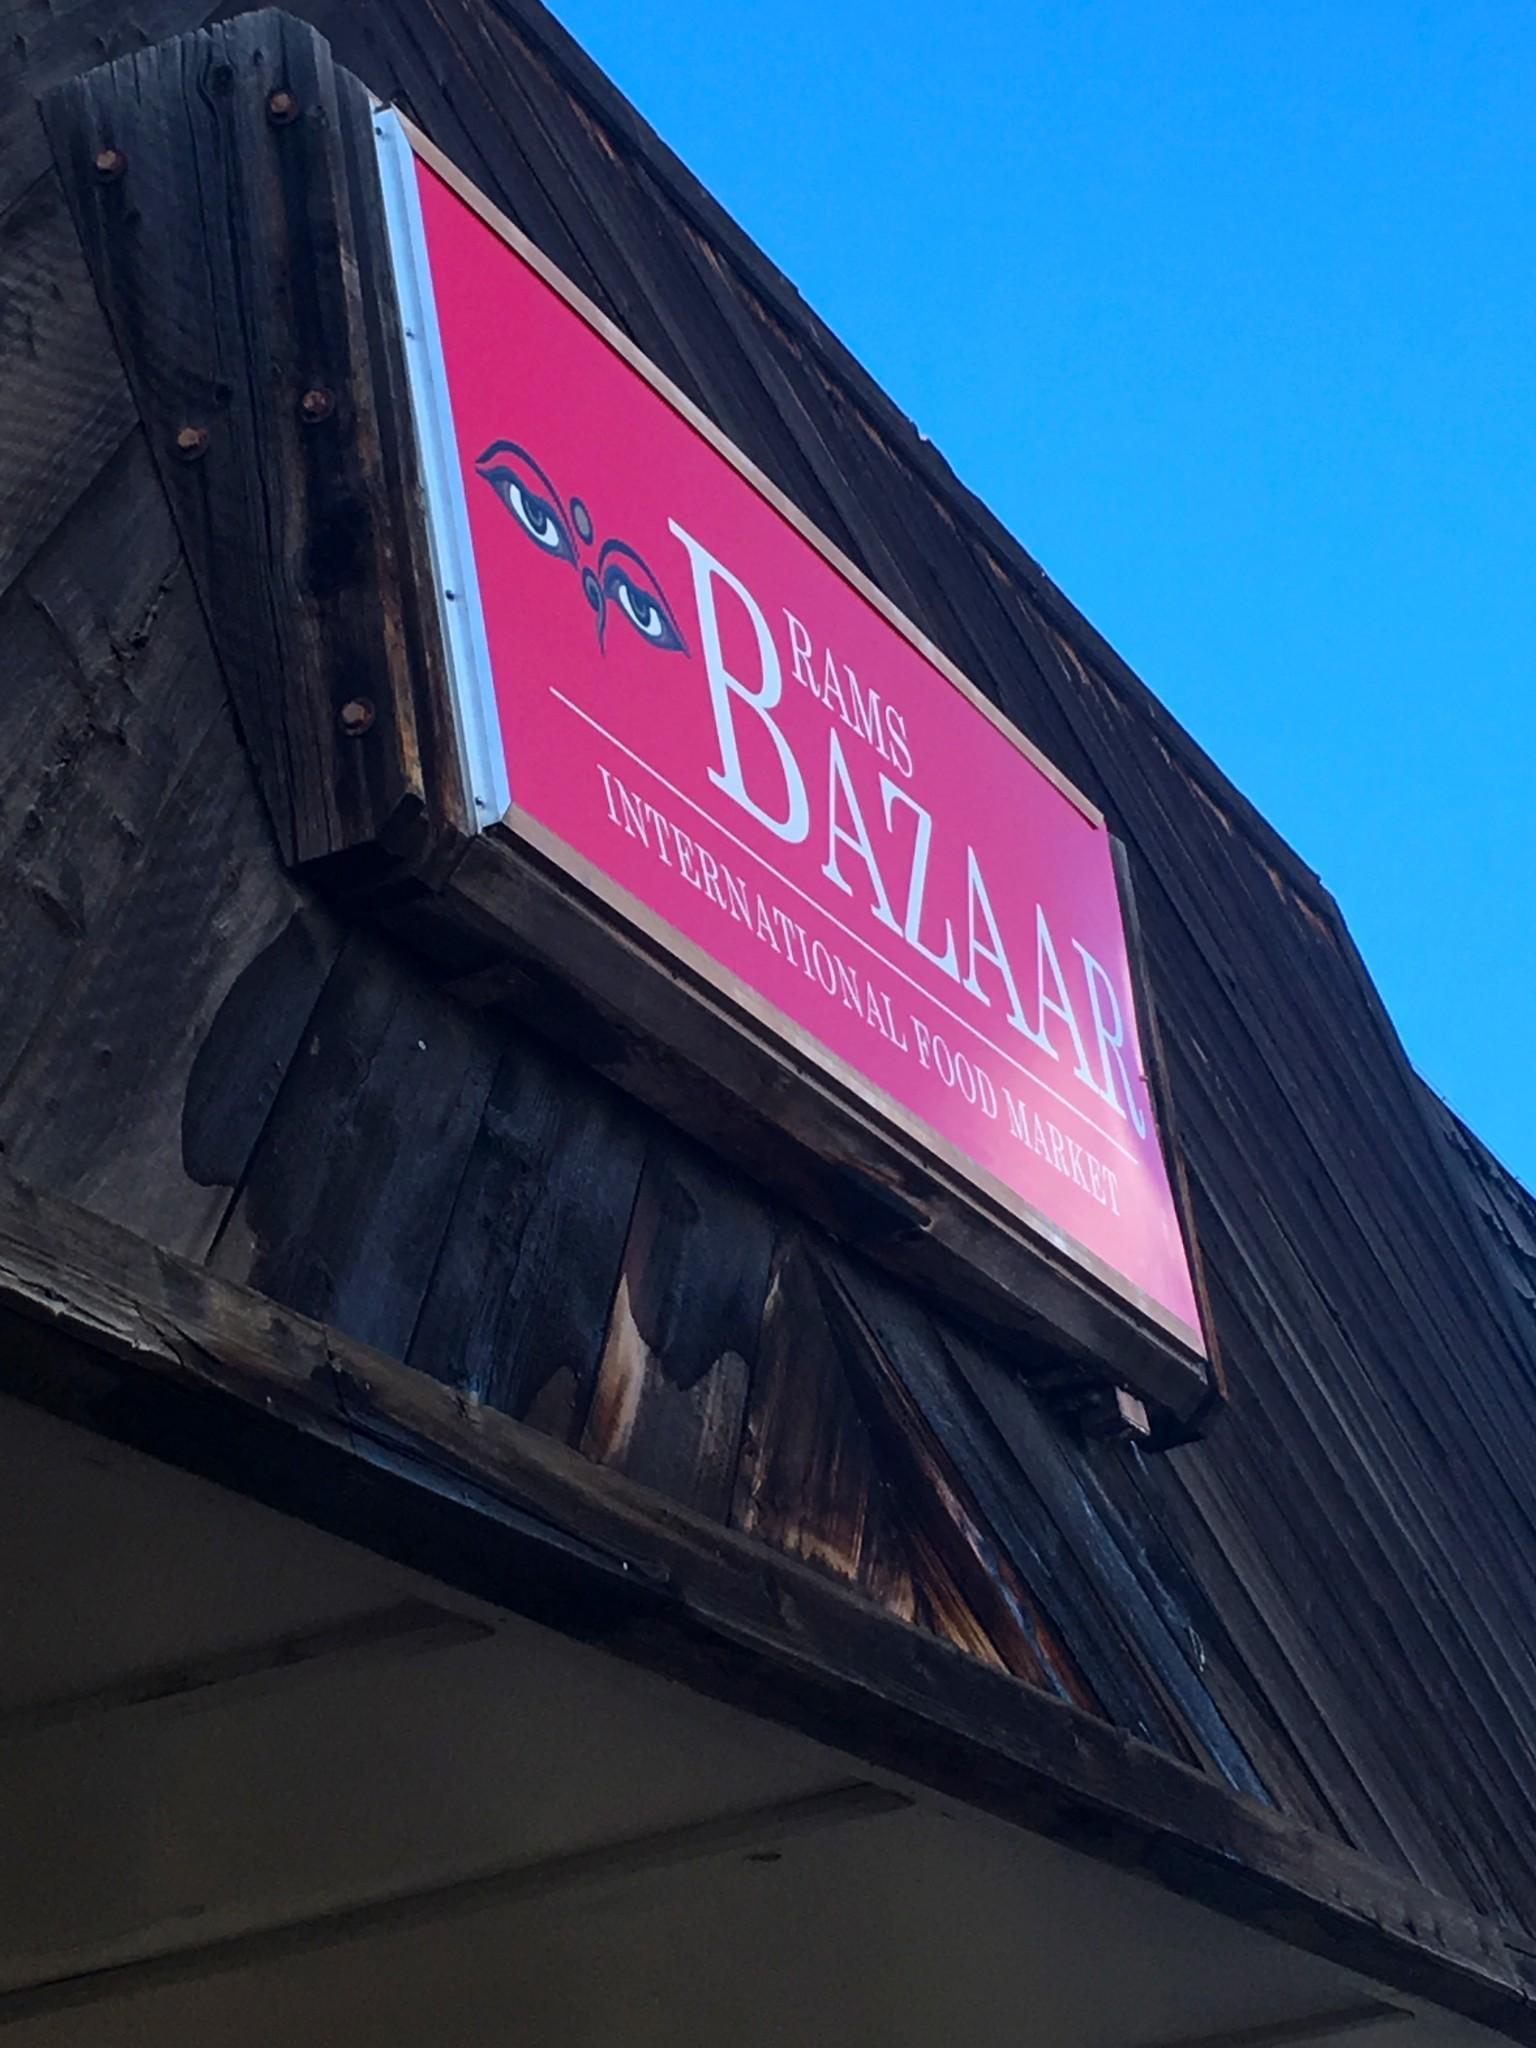 Sign of Rams Bazaar. Photo by Rachael Worthington